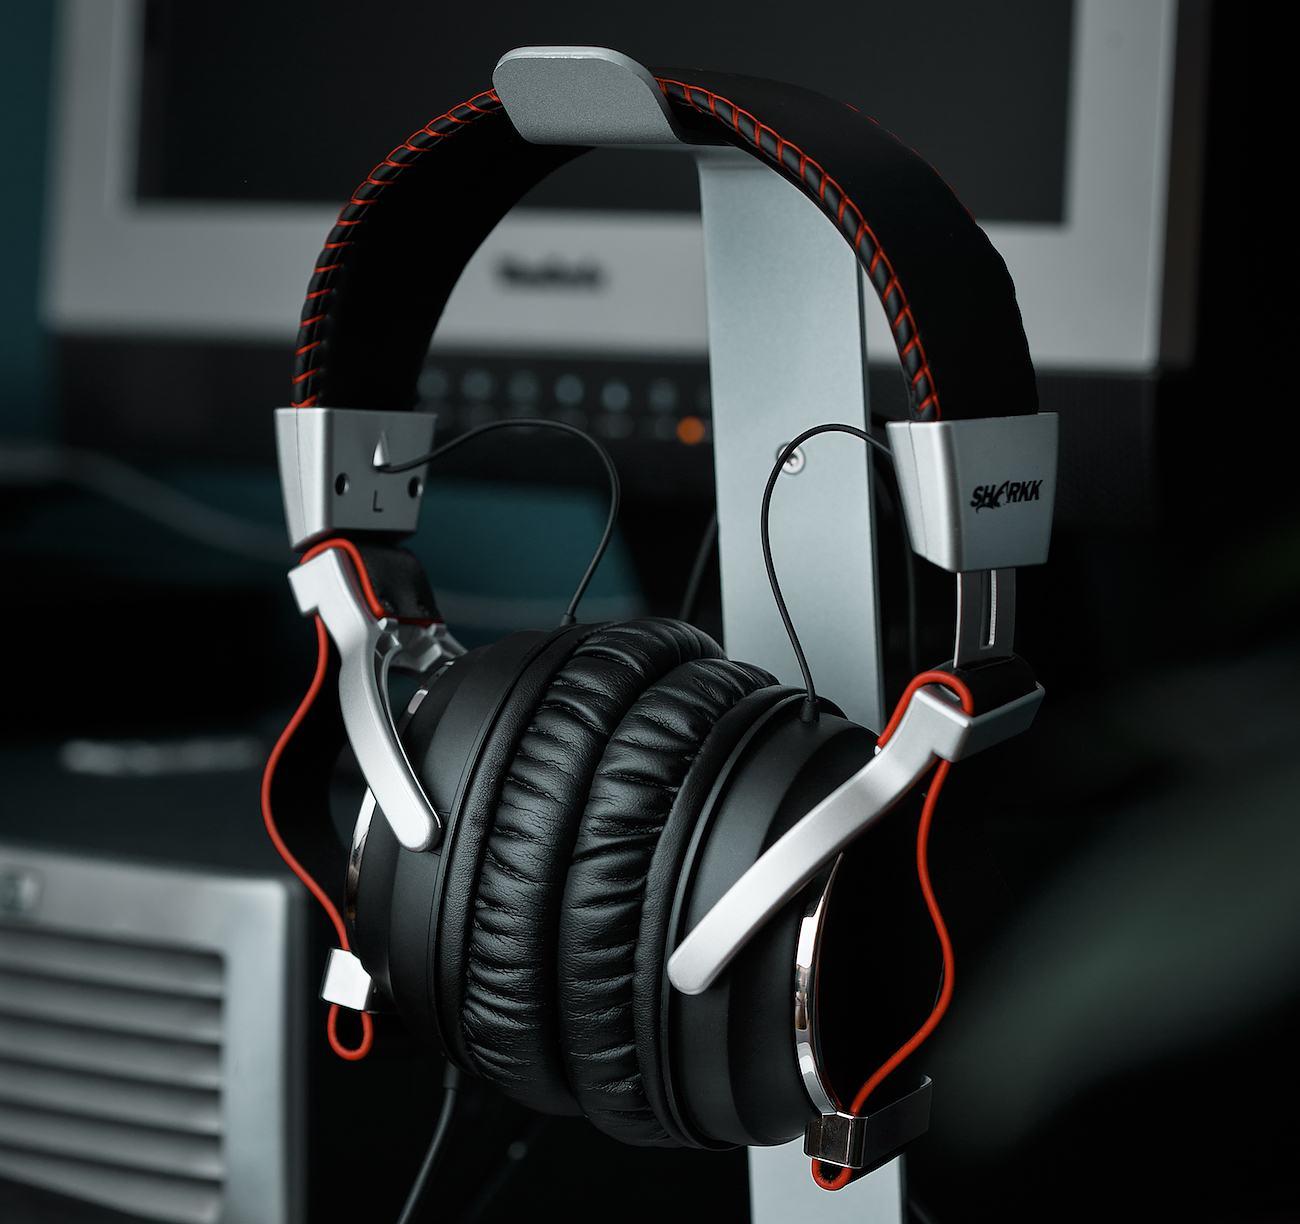 Sharkk Bravo Headphones – 10x Better Sound Quality